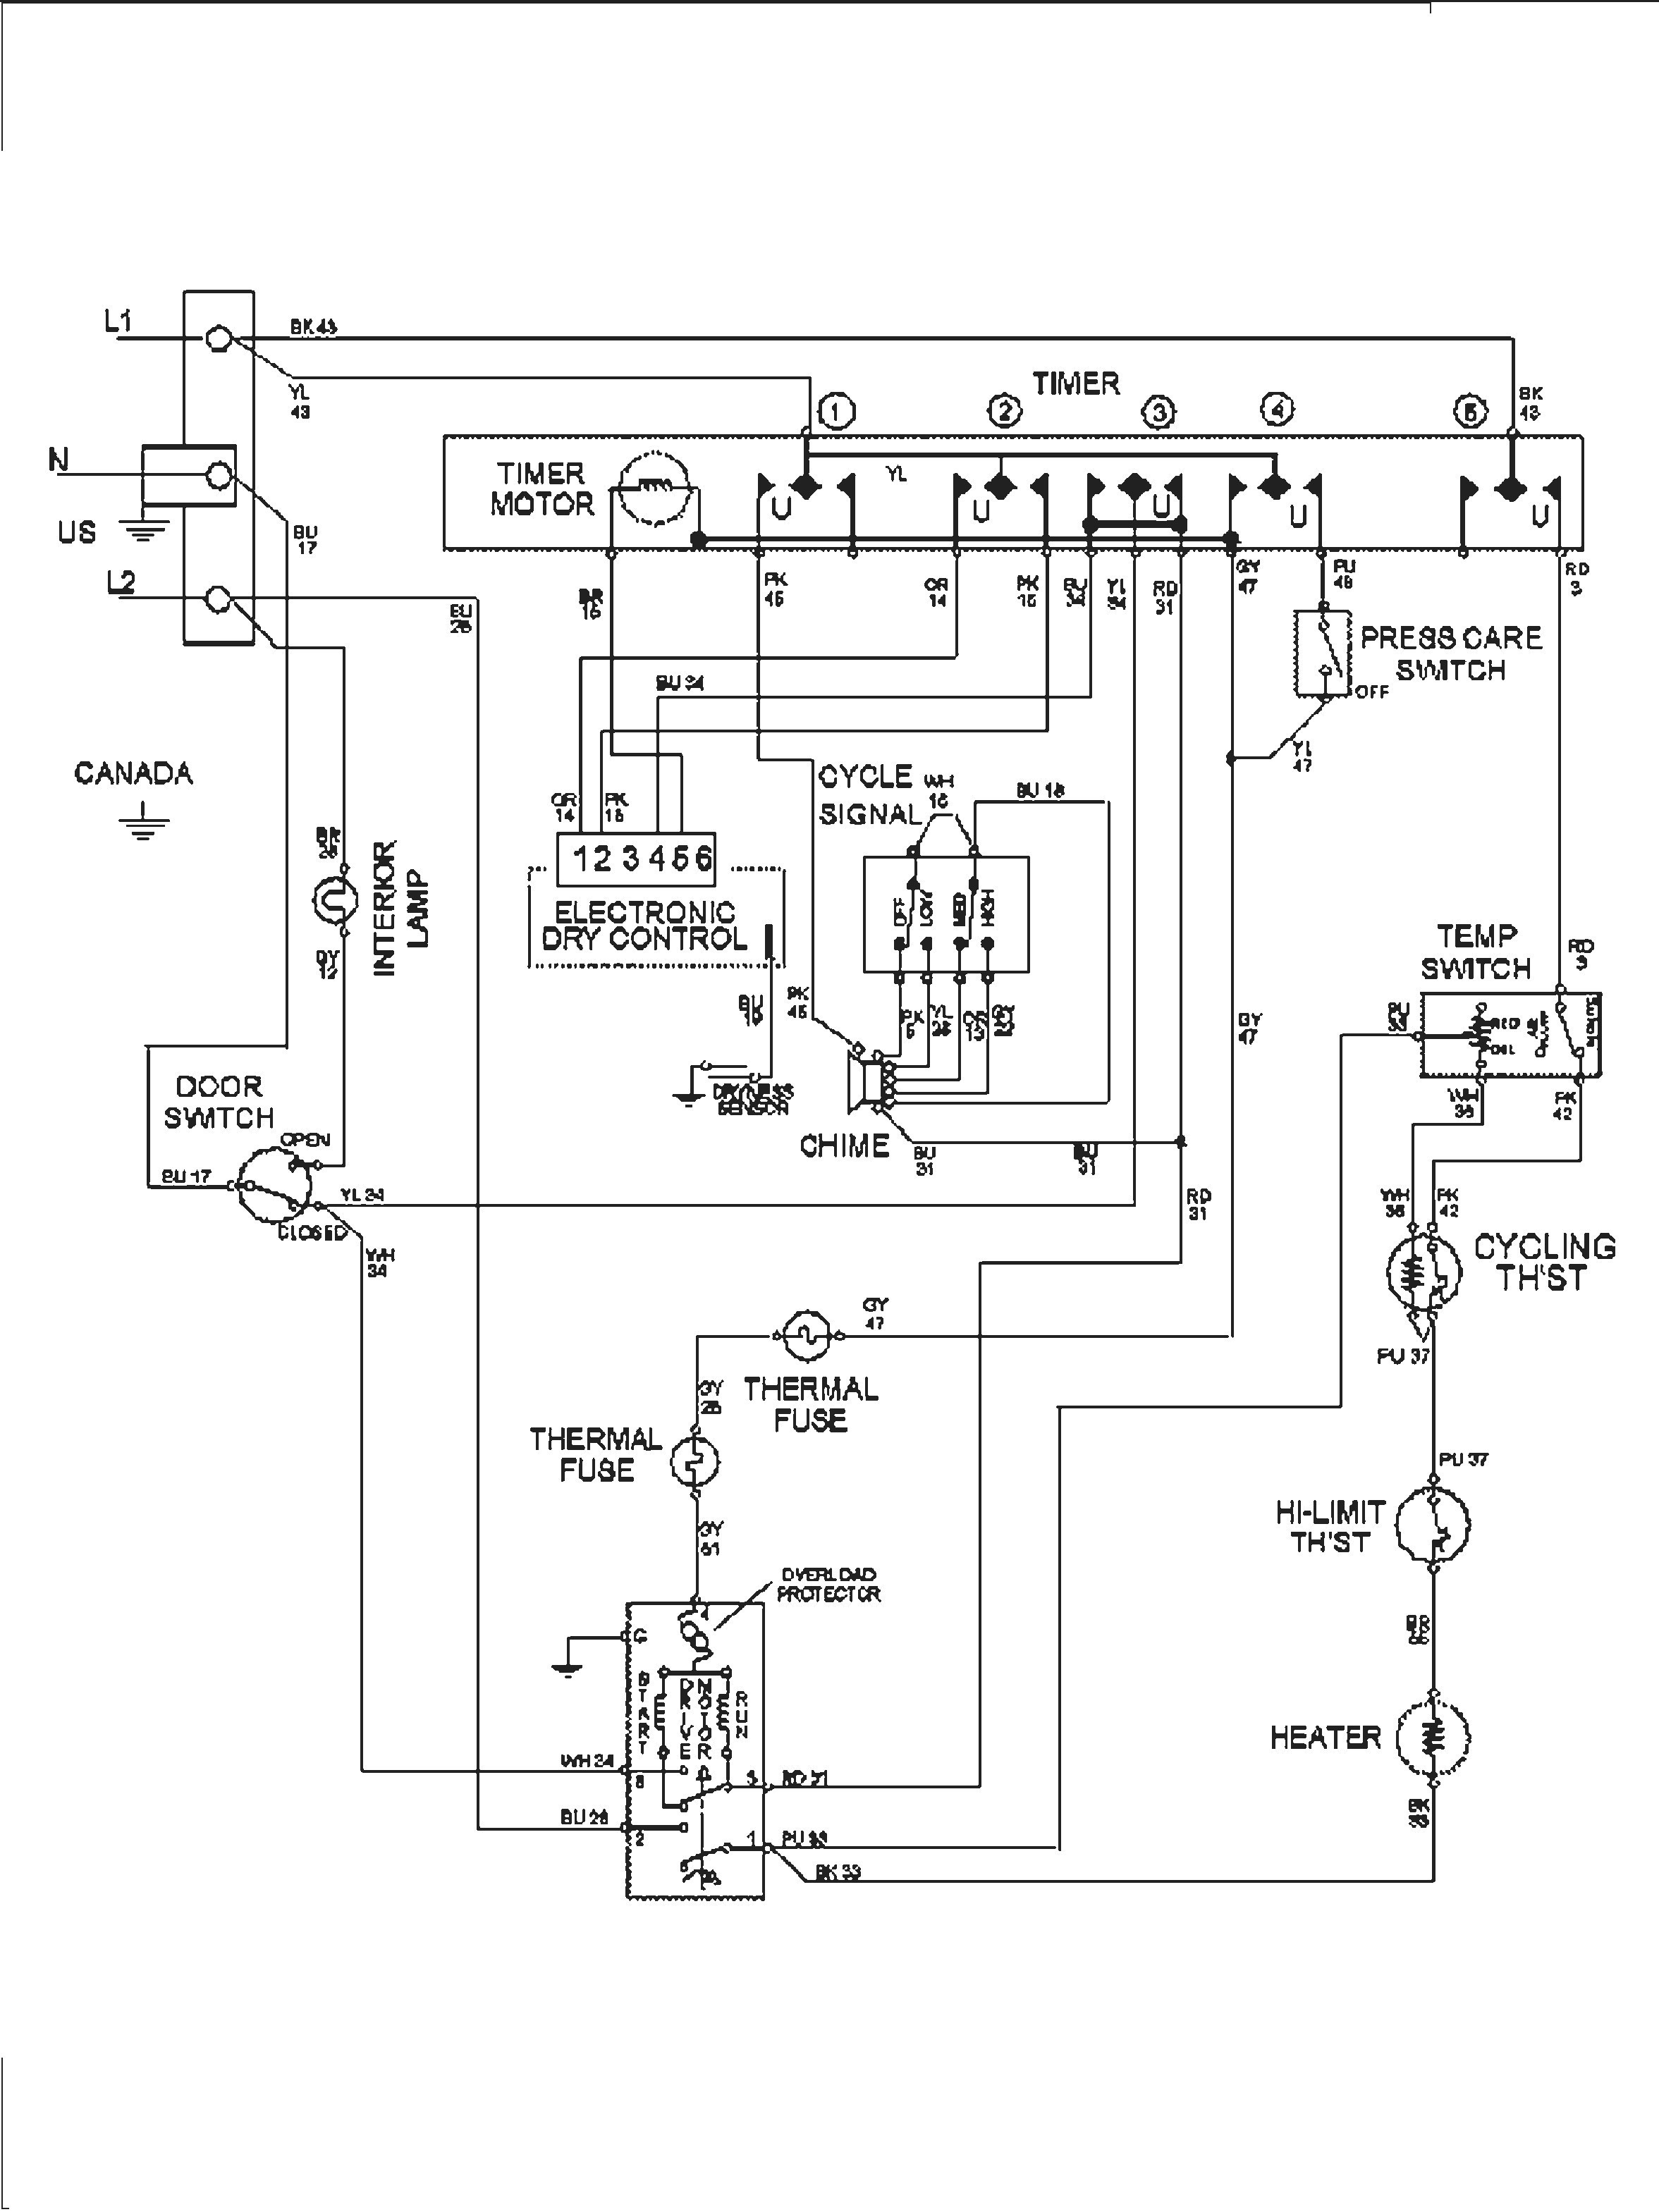 Whirlpool Duet Dryer Heating Element Wiring Diagram Unique